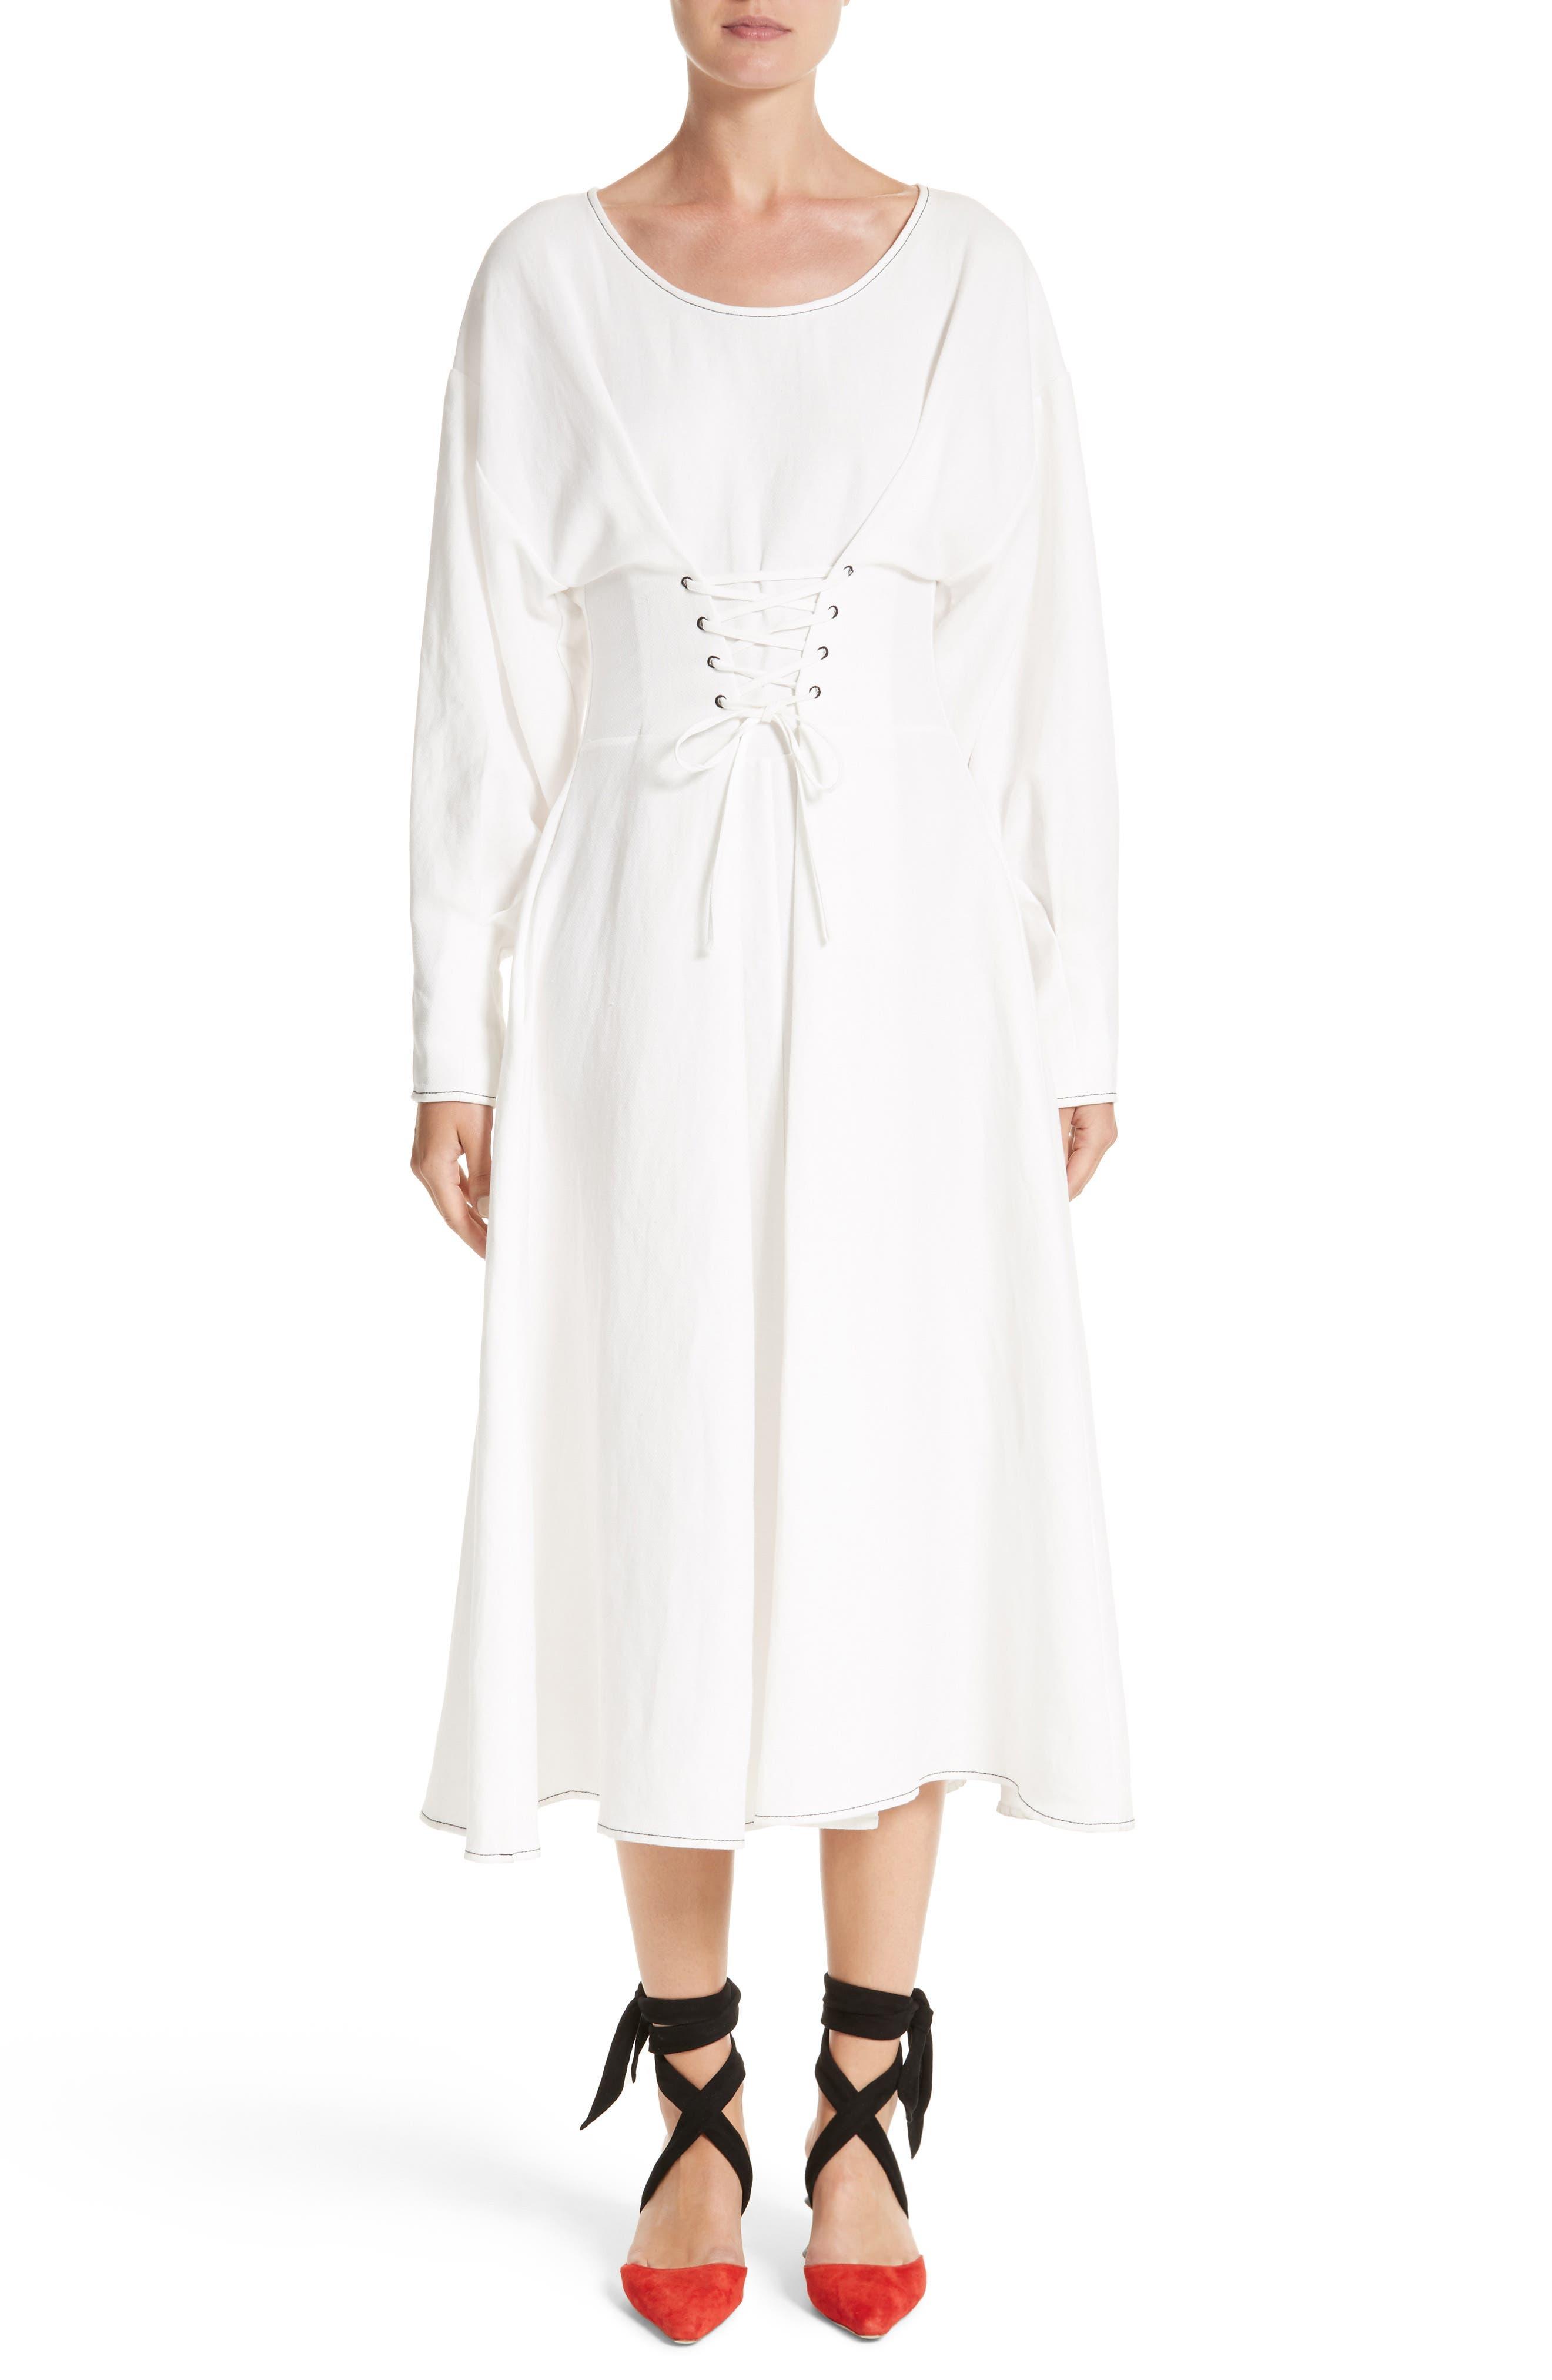 Rejina Pyo Corset Laced Linen Blend Dress